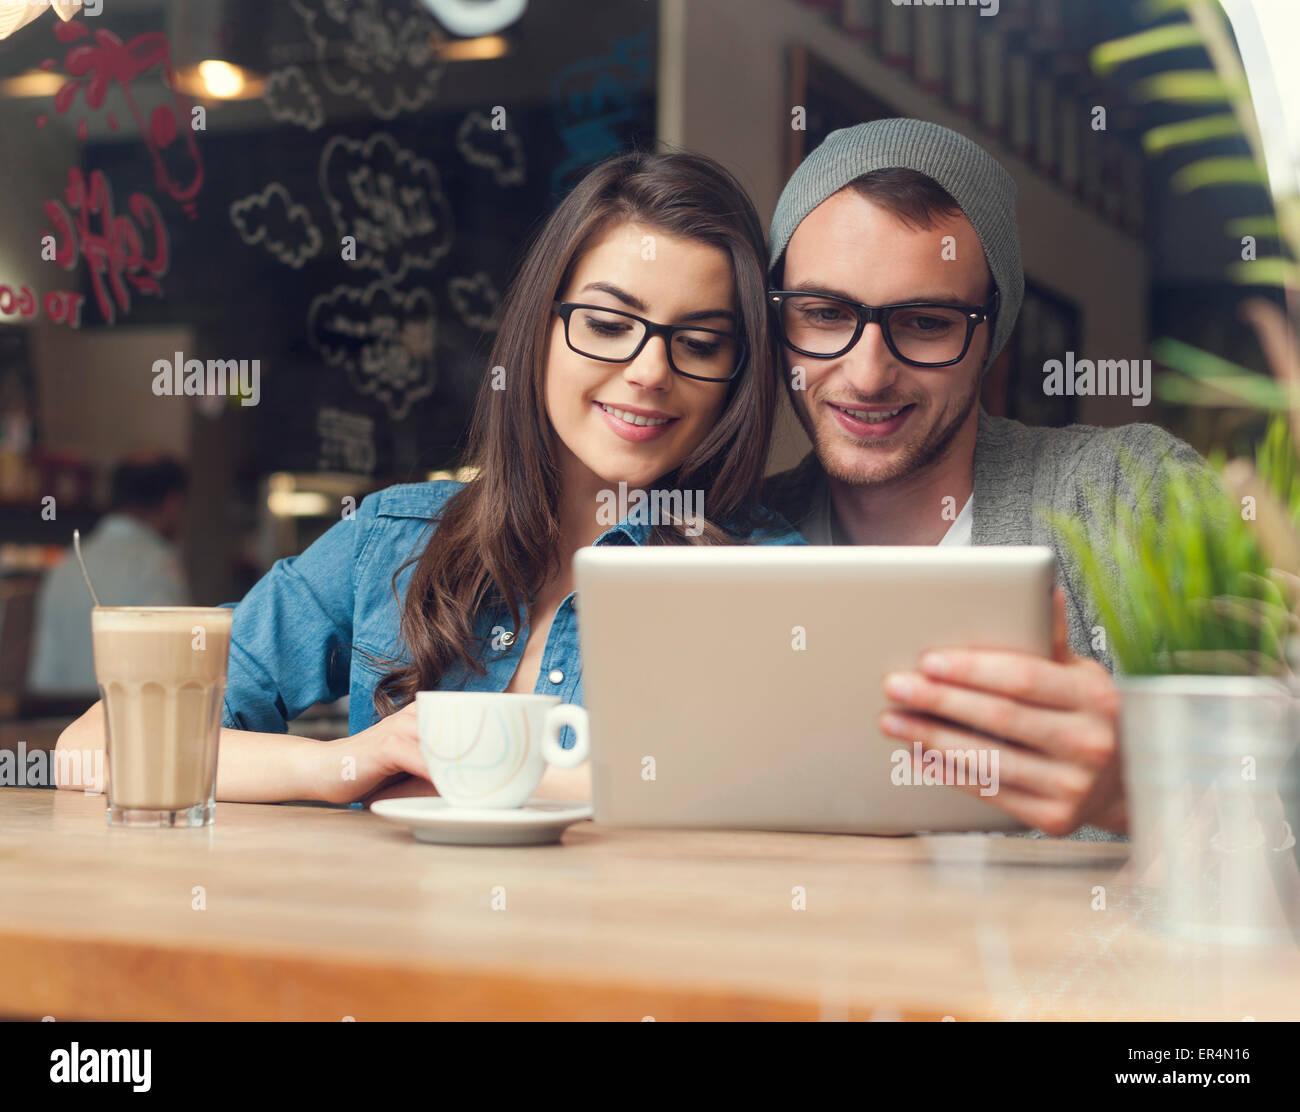 Hipster par disfrutar de conexión inalámbrica a internet en la cafetería. Cracovia, Polonia Imagen De Stock